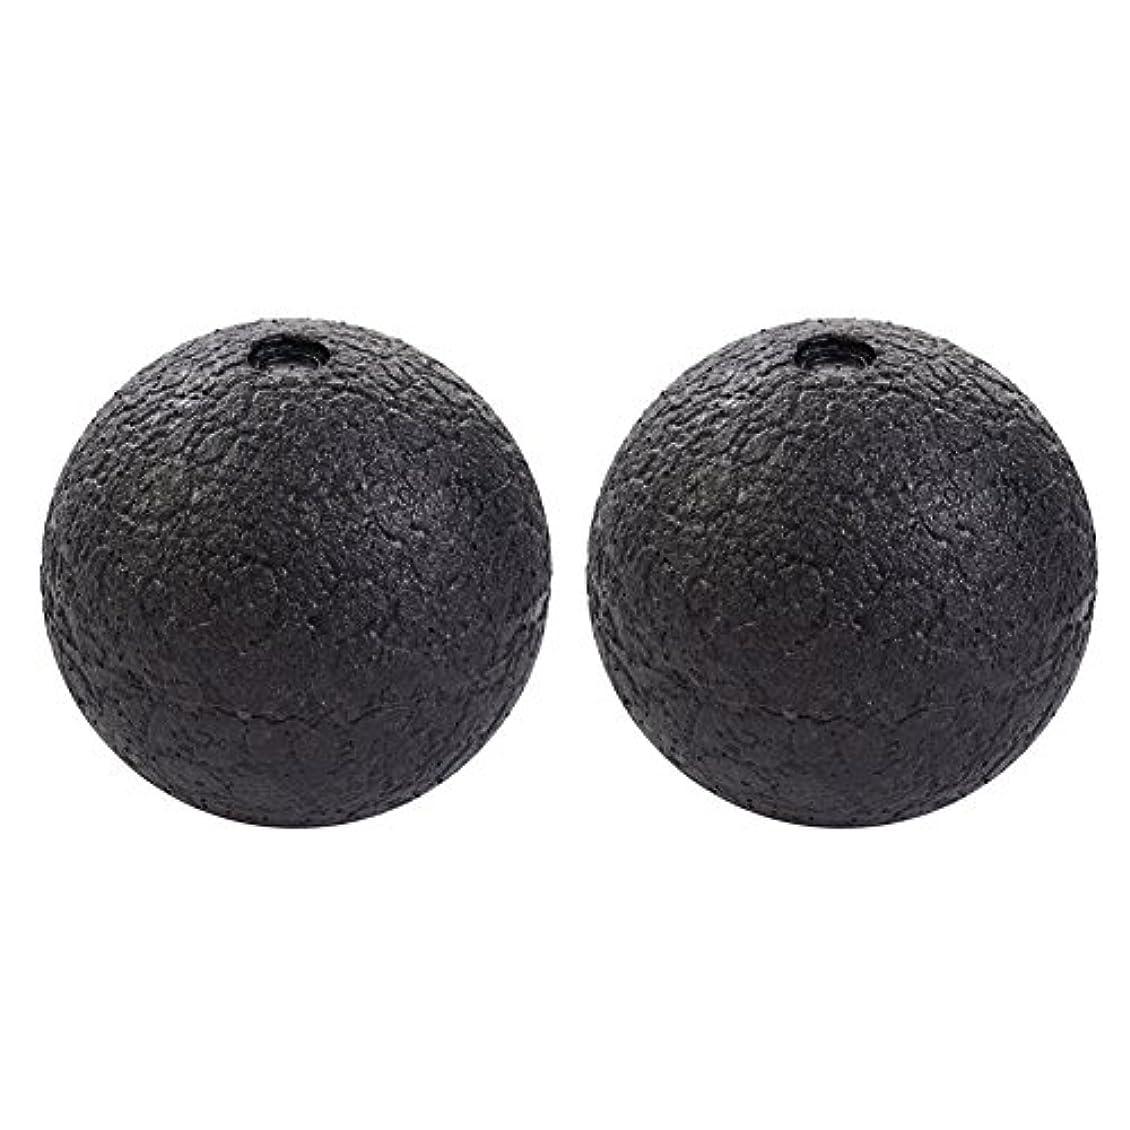 Hjuns マッサージボール筋膜ストレス消除 スマホ病 直径10cm/8cm PCやり過ぎ つらい腰痛 肩こり 足裏マッサージにストレッチボール 2個セット